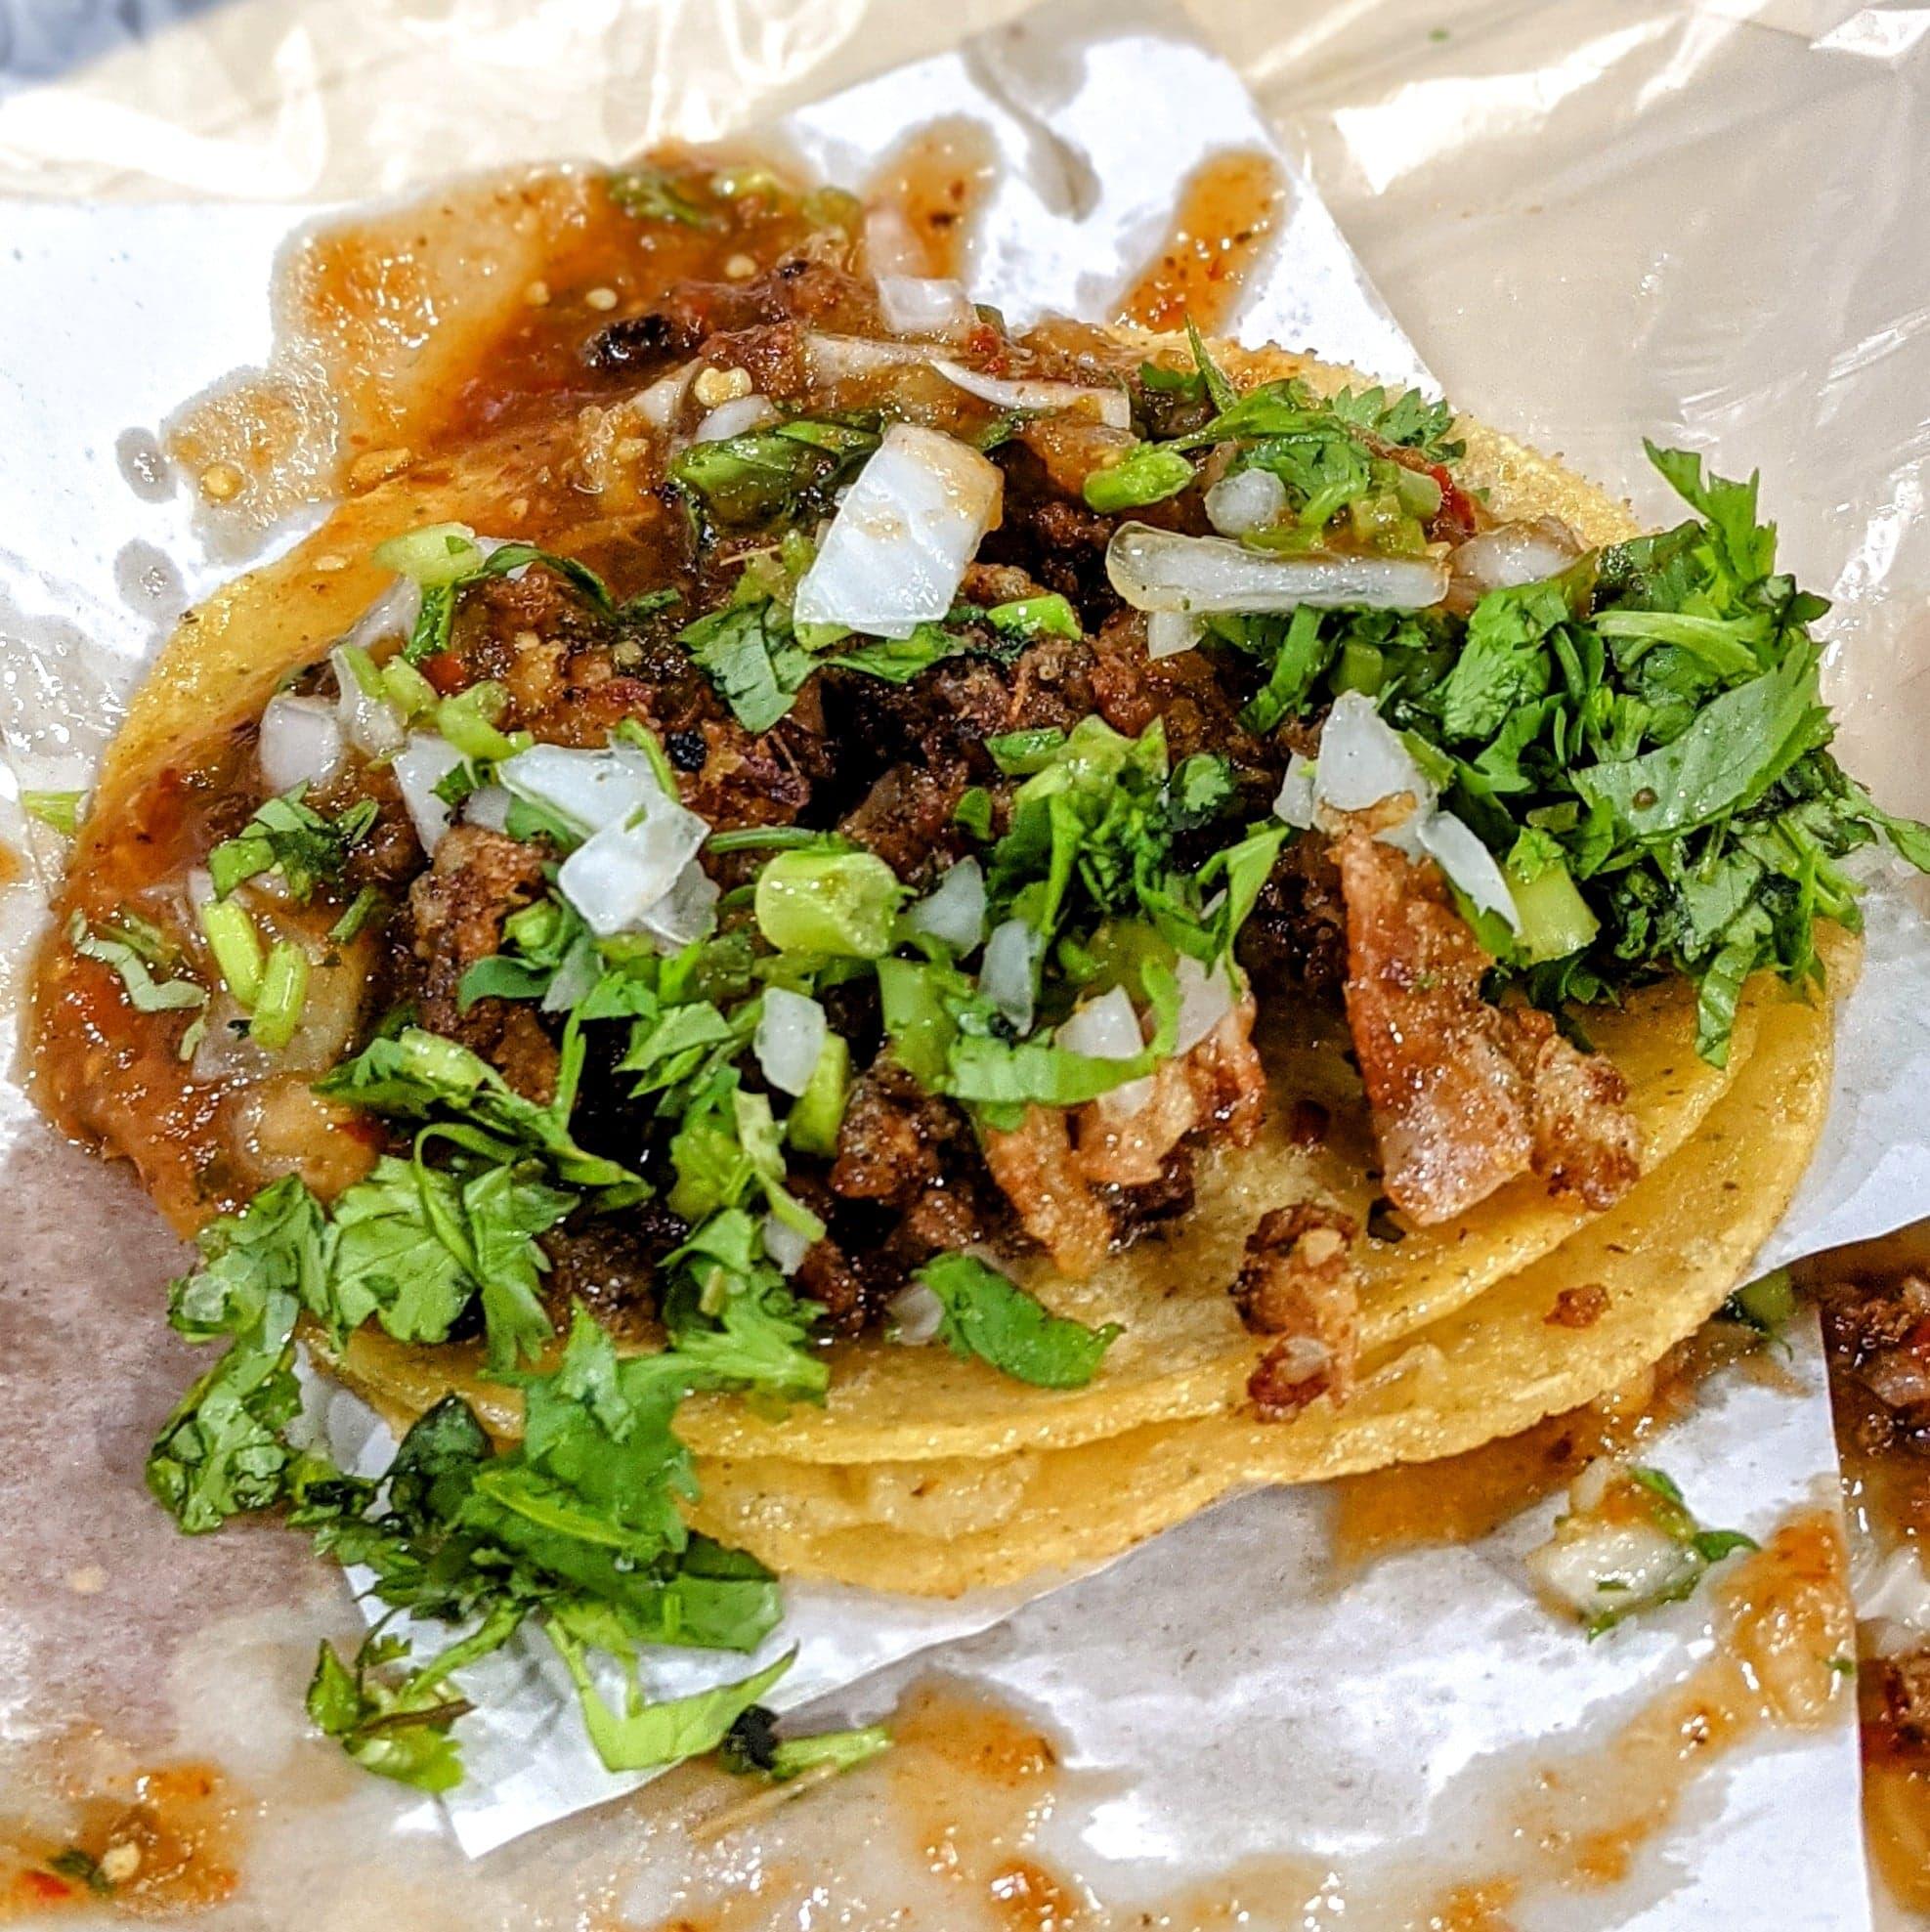 Tacos Martin